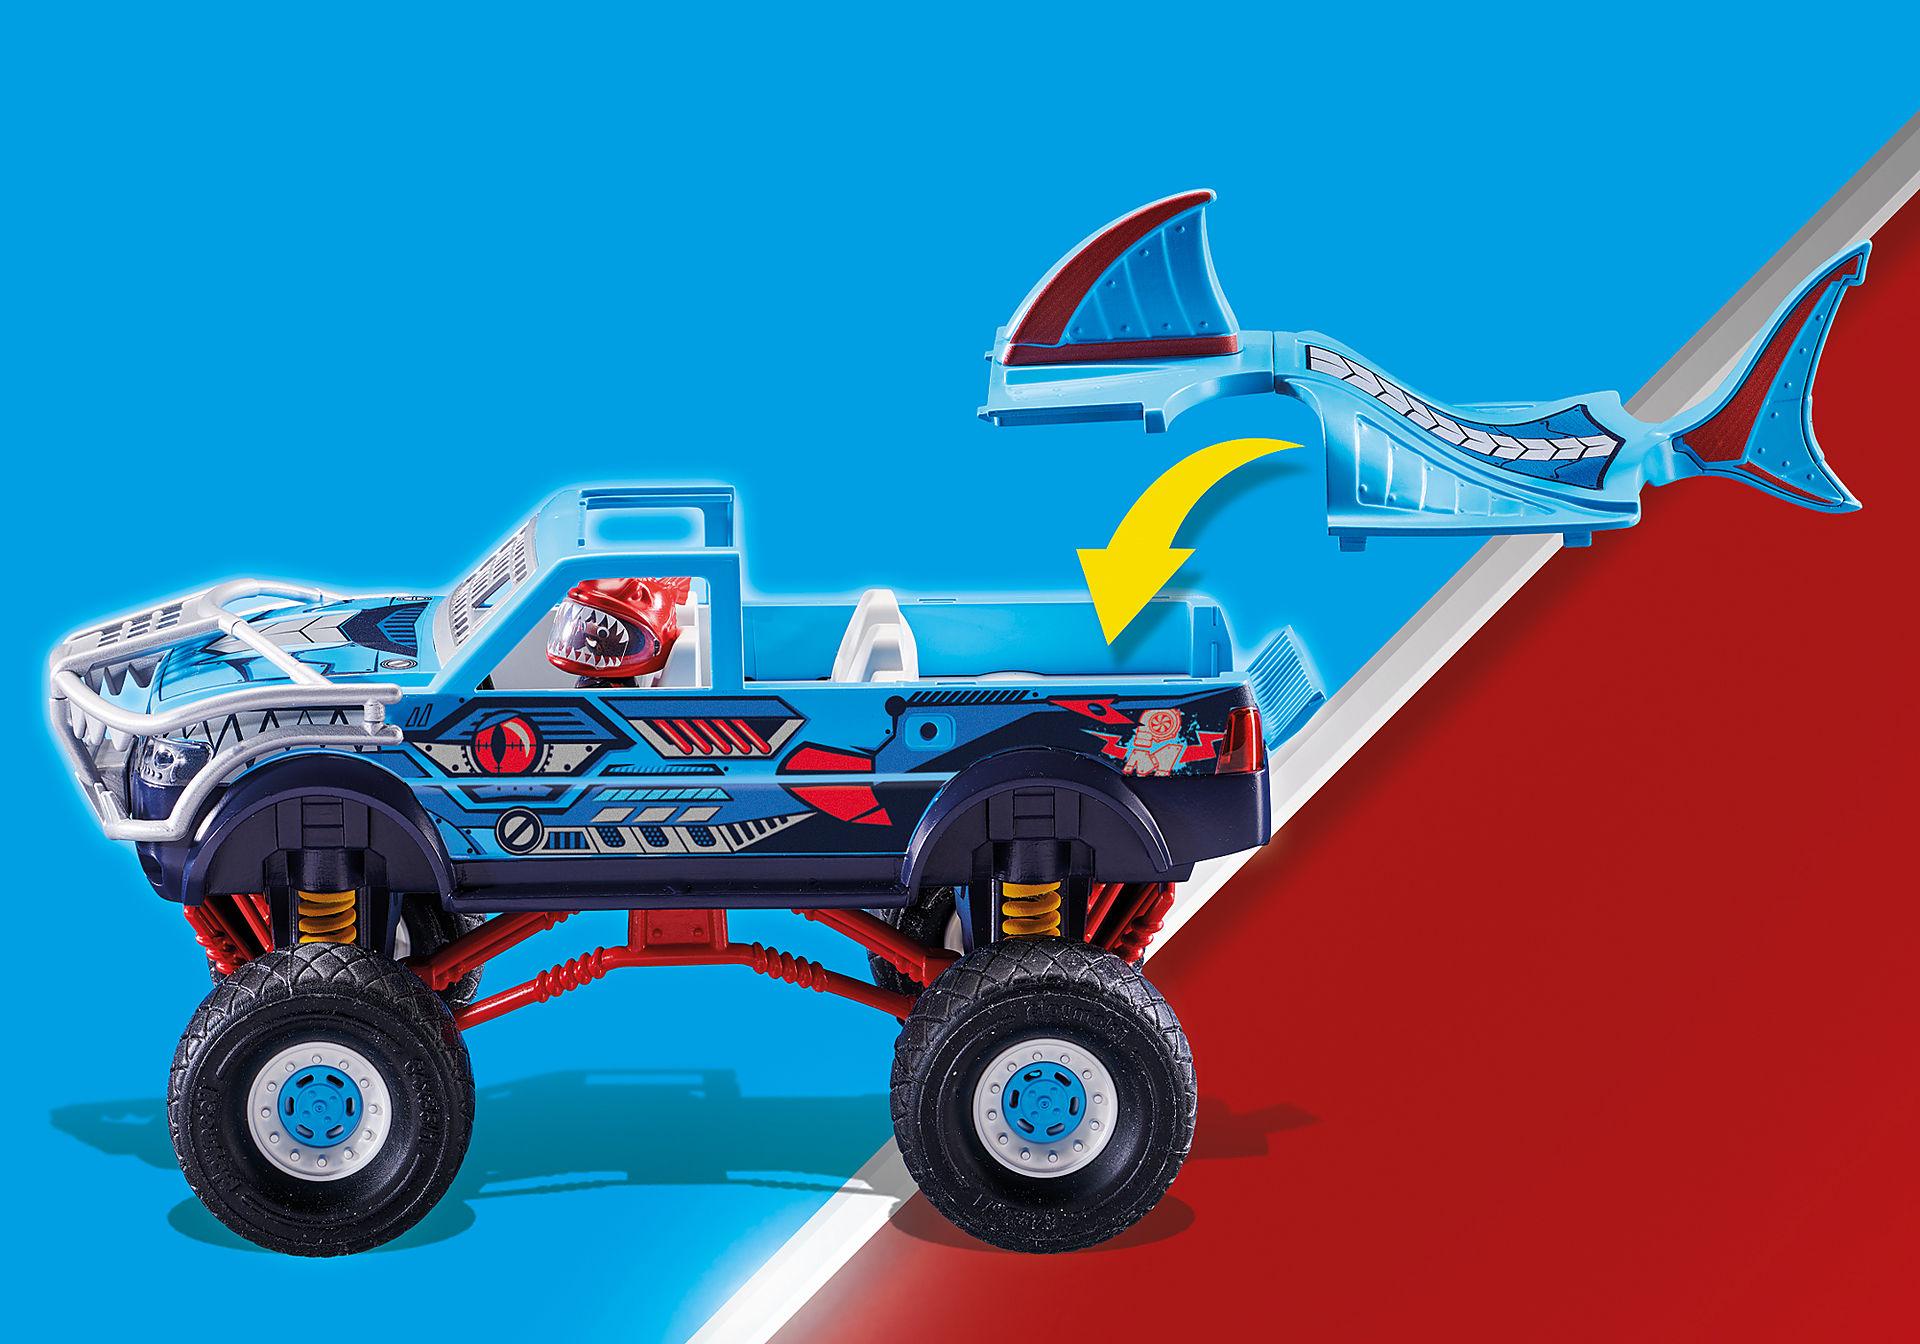 70550 Stuntshow Monster Truck Hval zoom image6